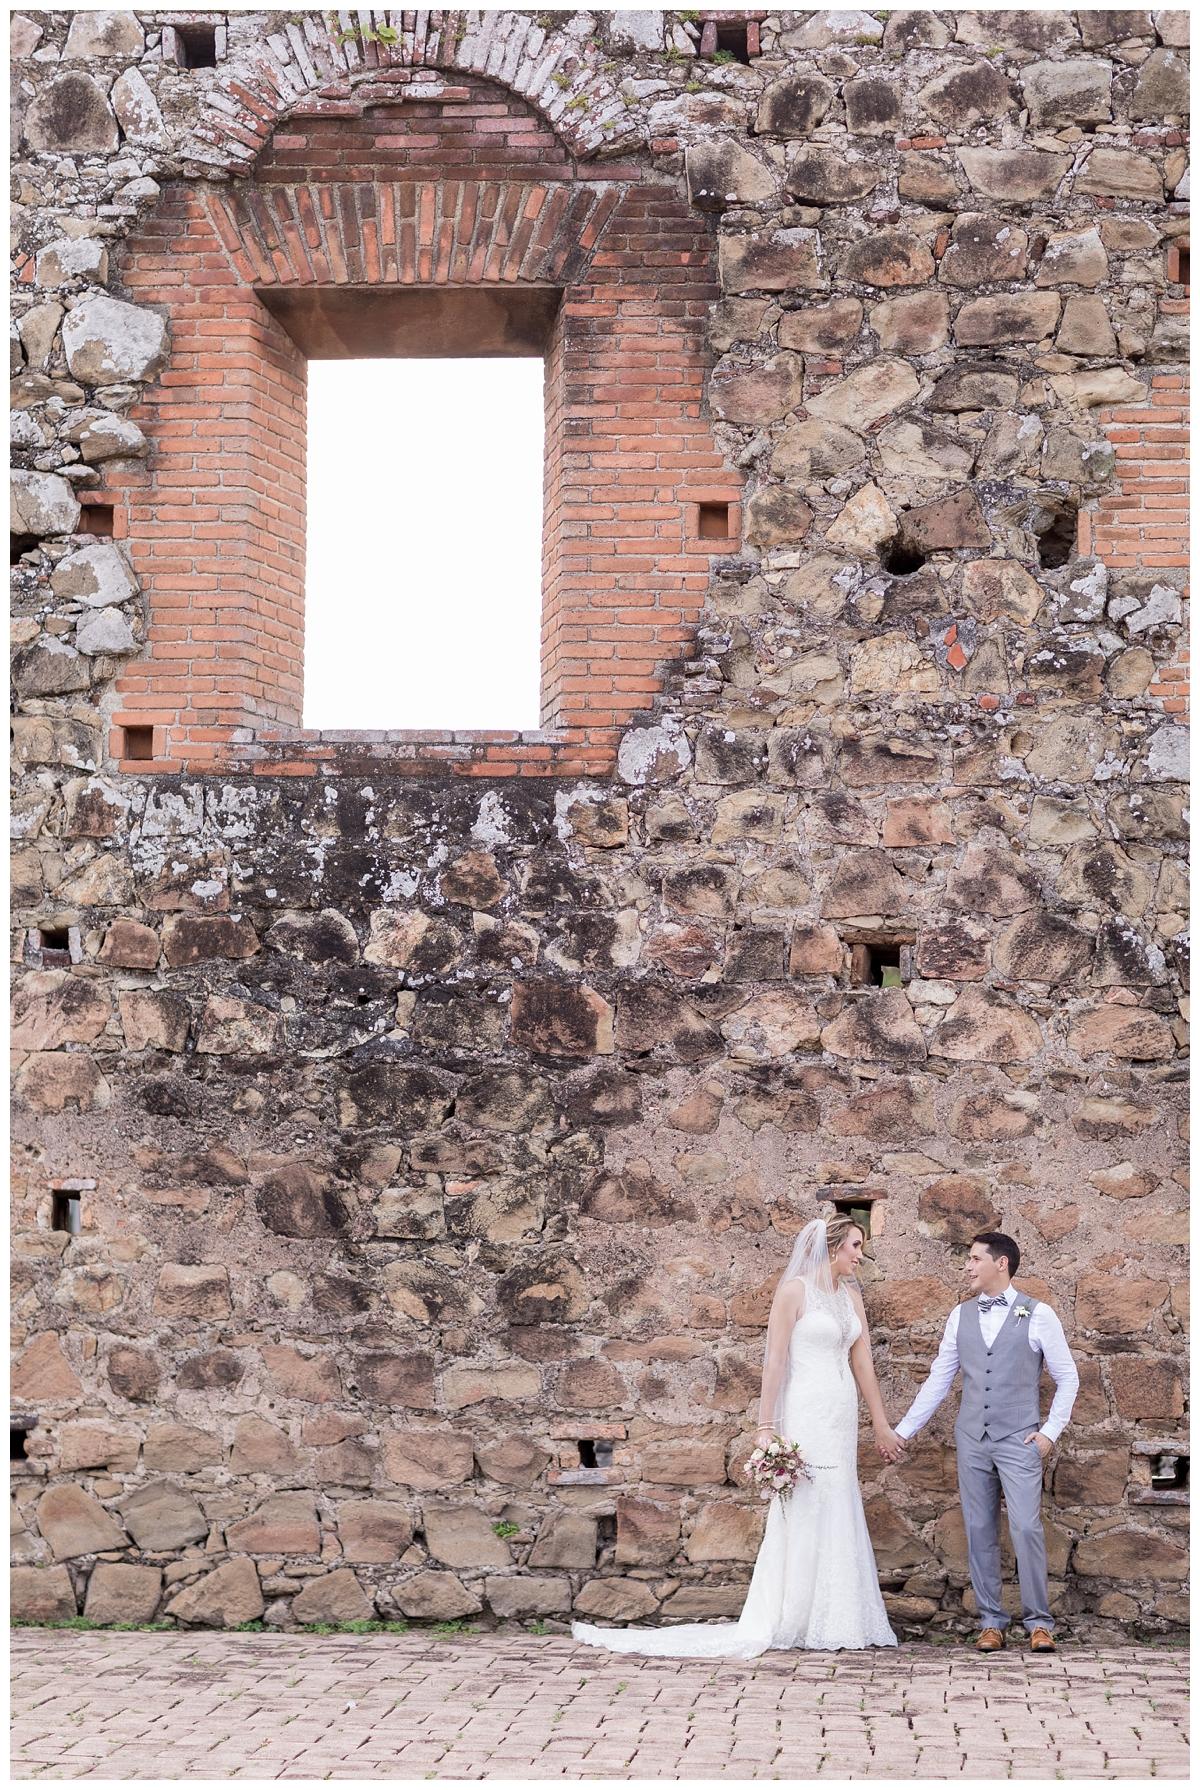 Panama Destination wedding photographer and videographer team